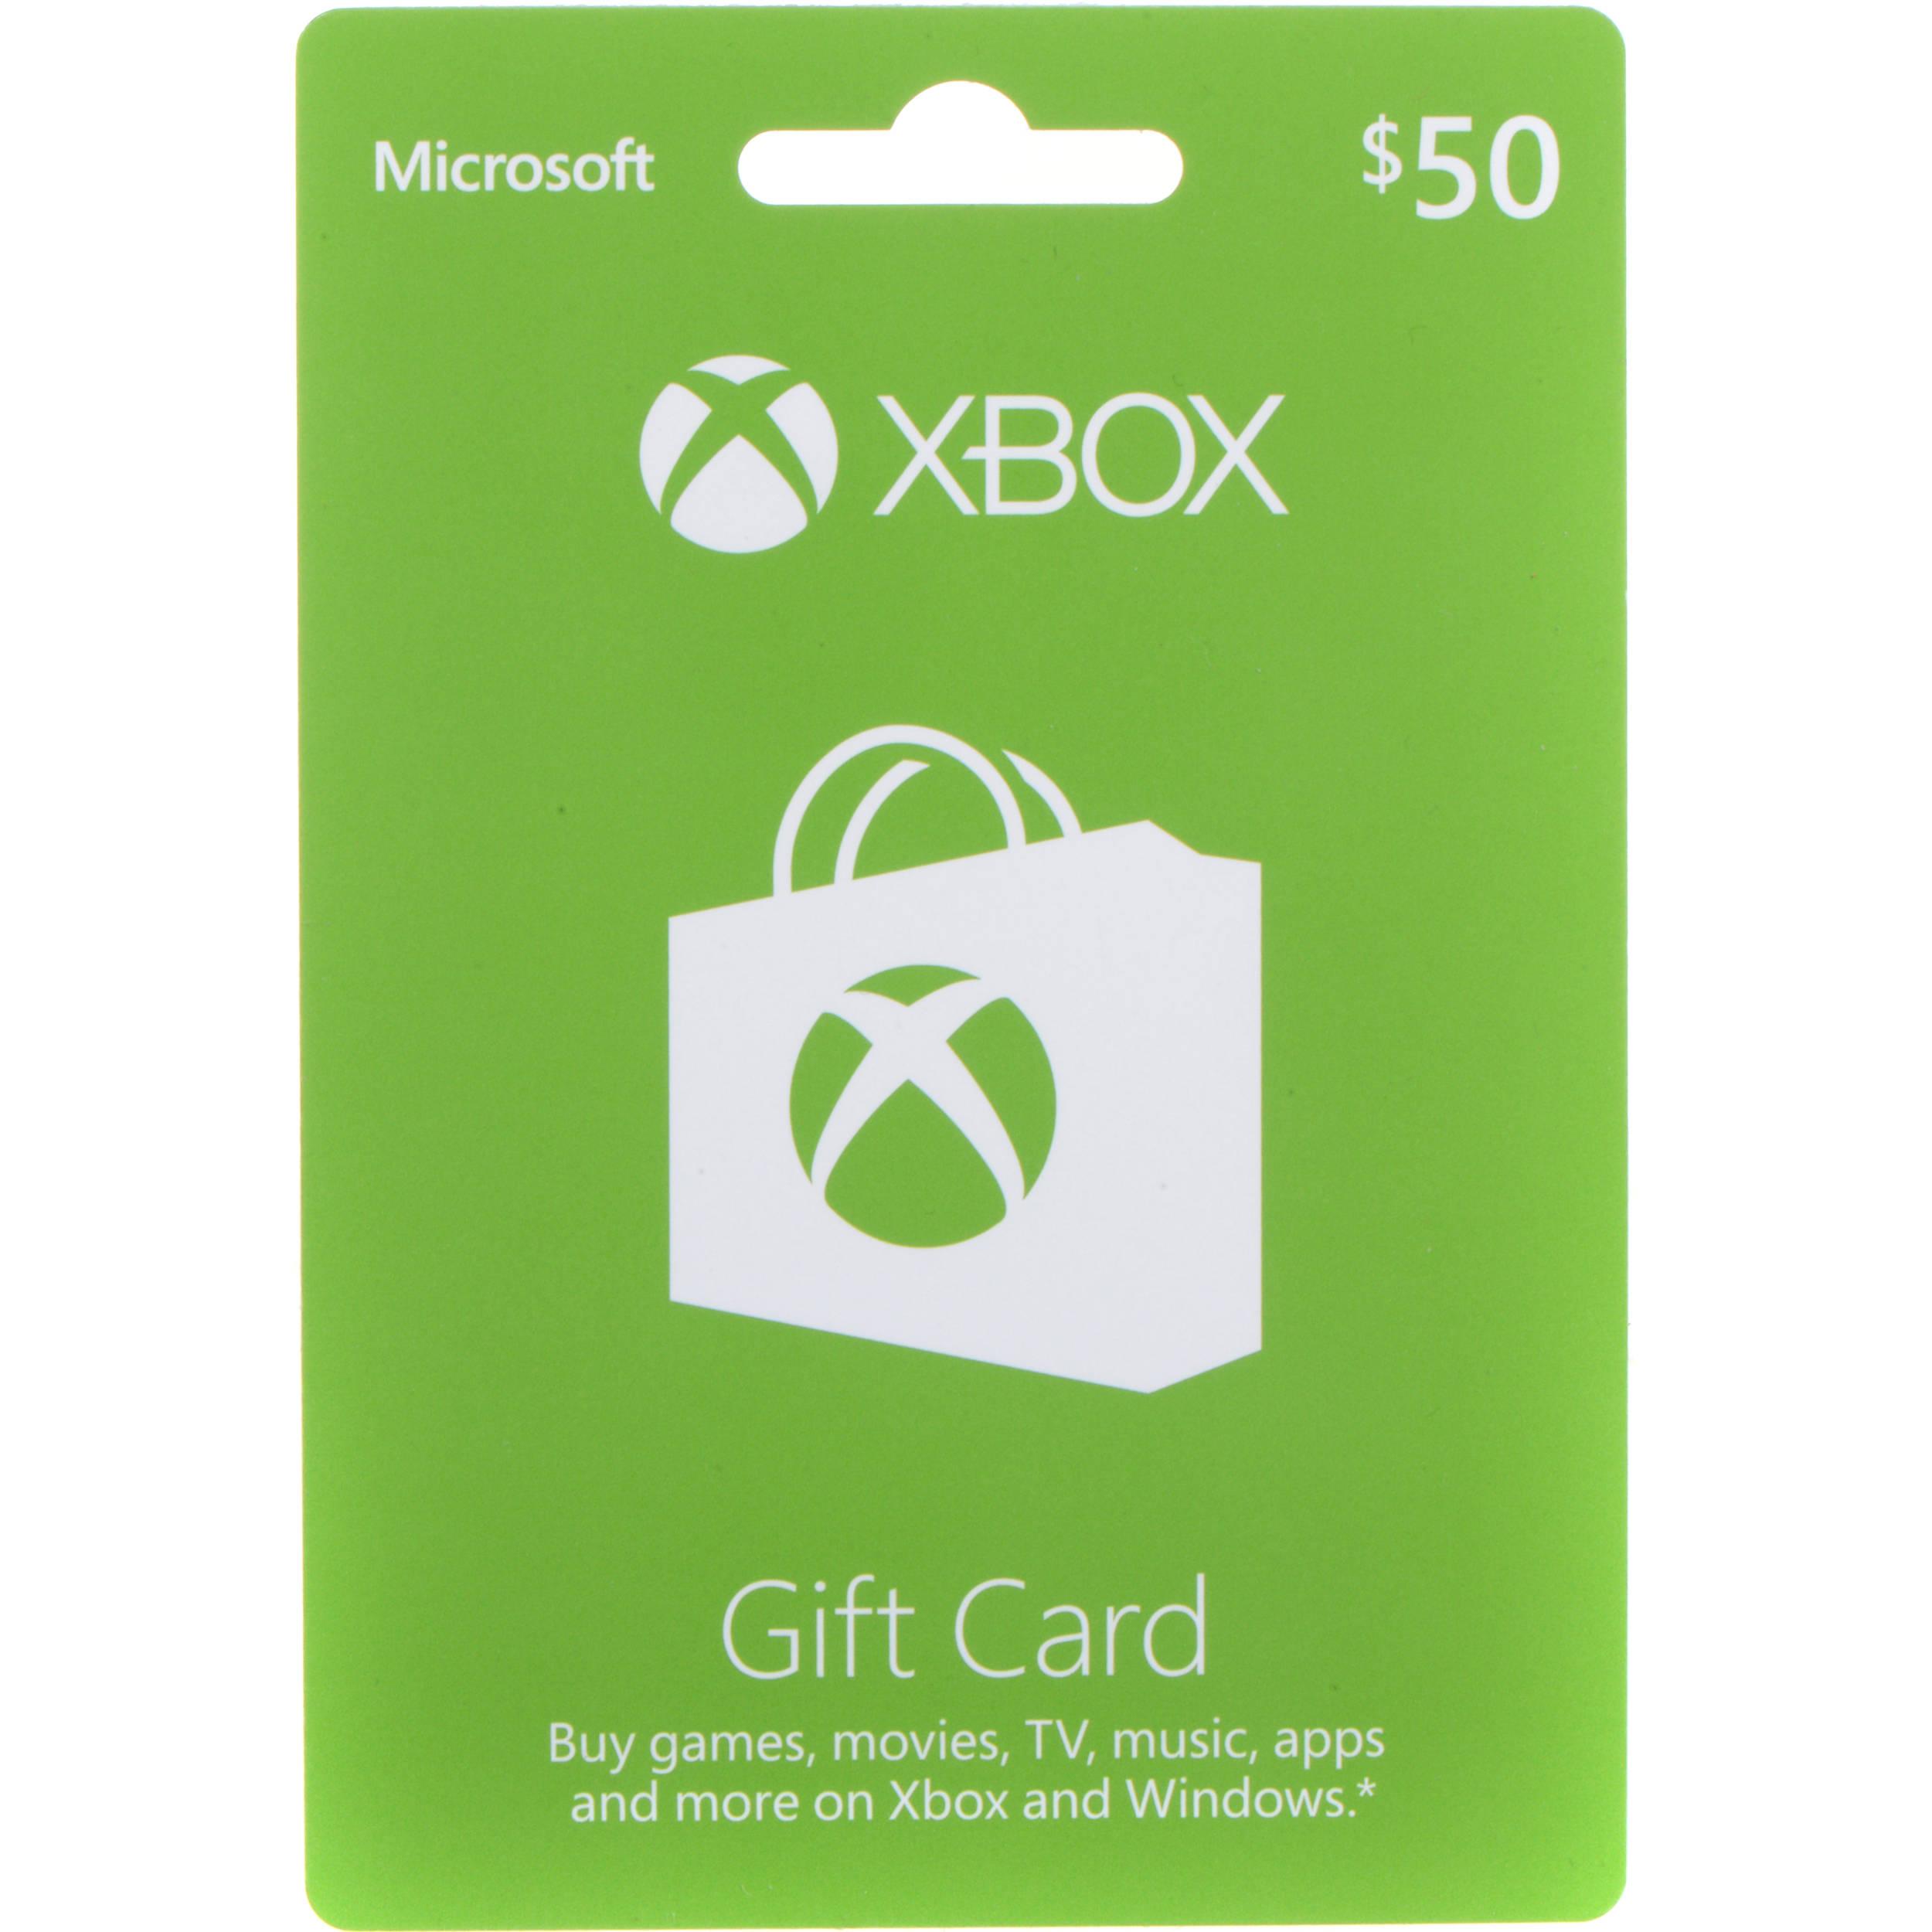 Microsoft Xbox Live $50 Gift Card 33630 B&H Photo Video